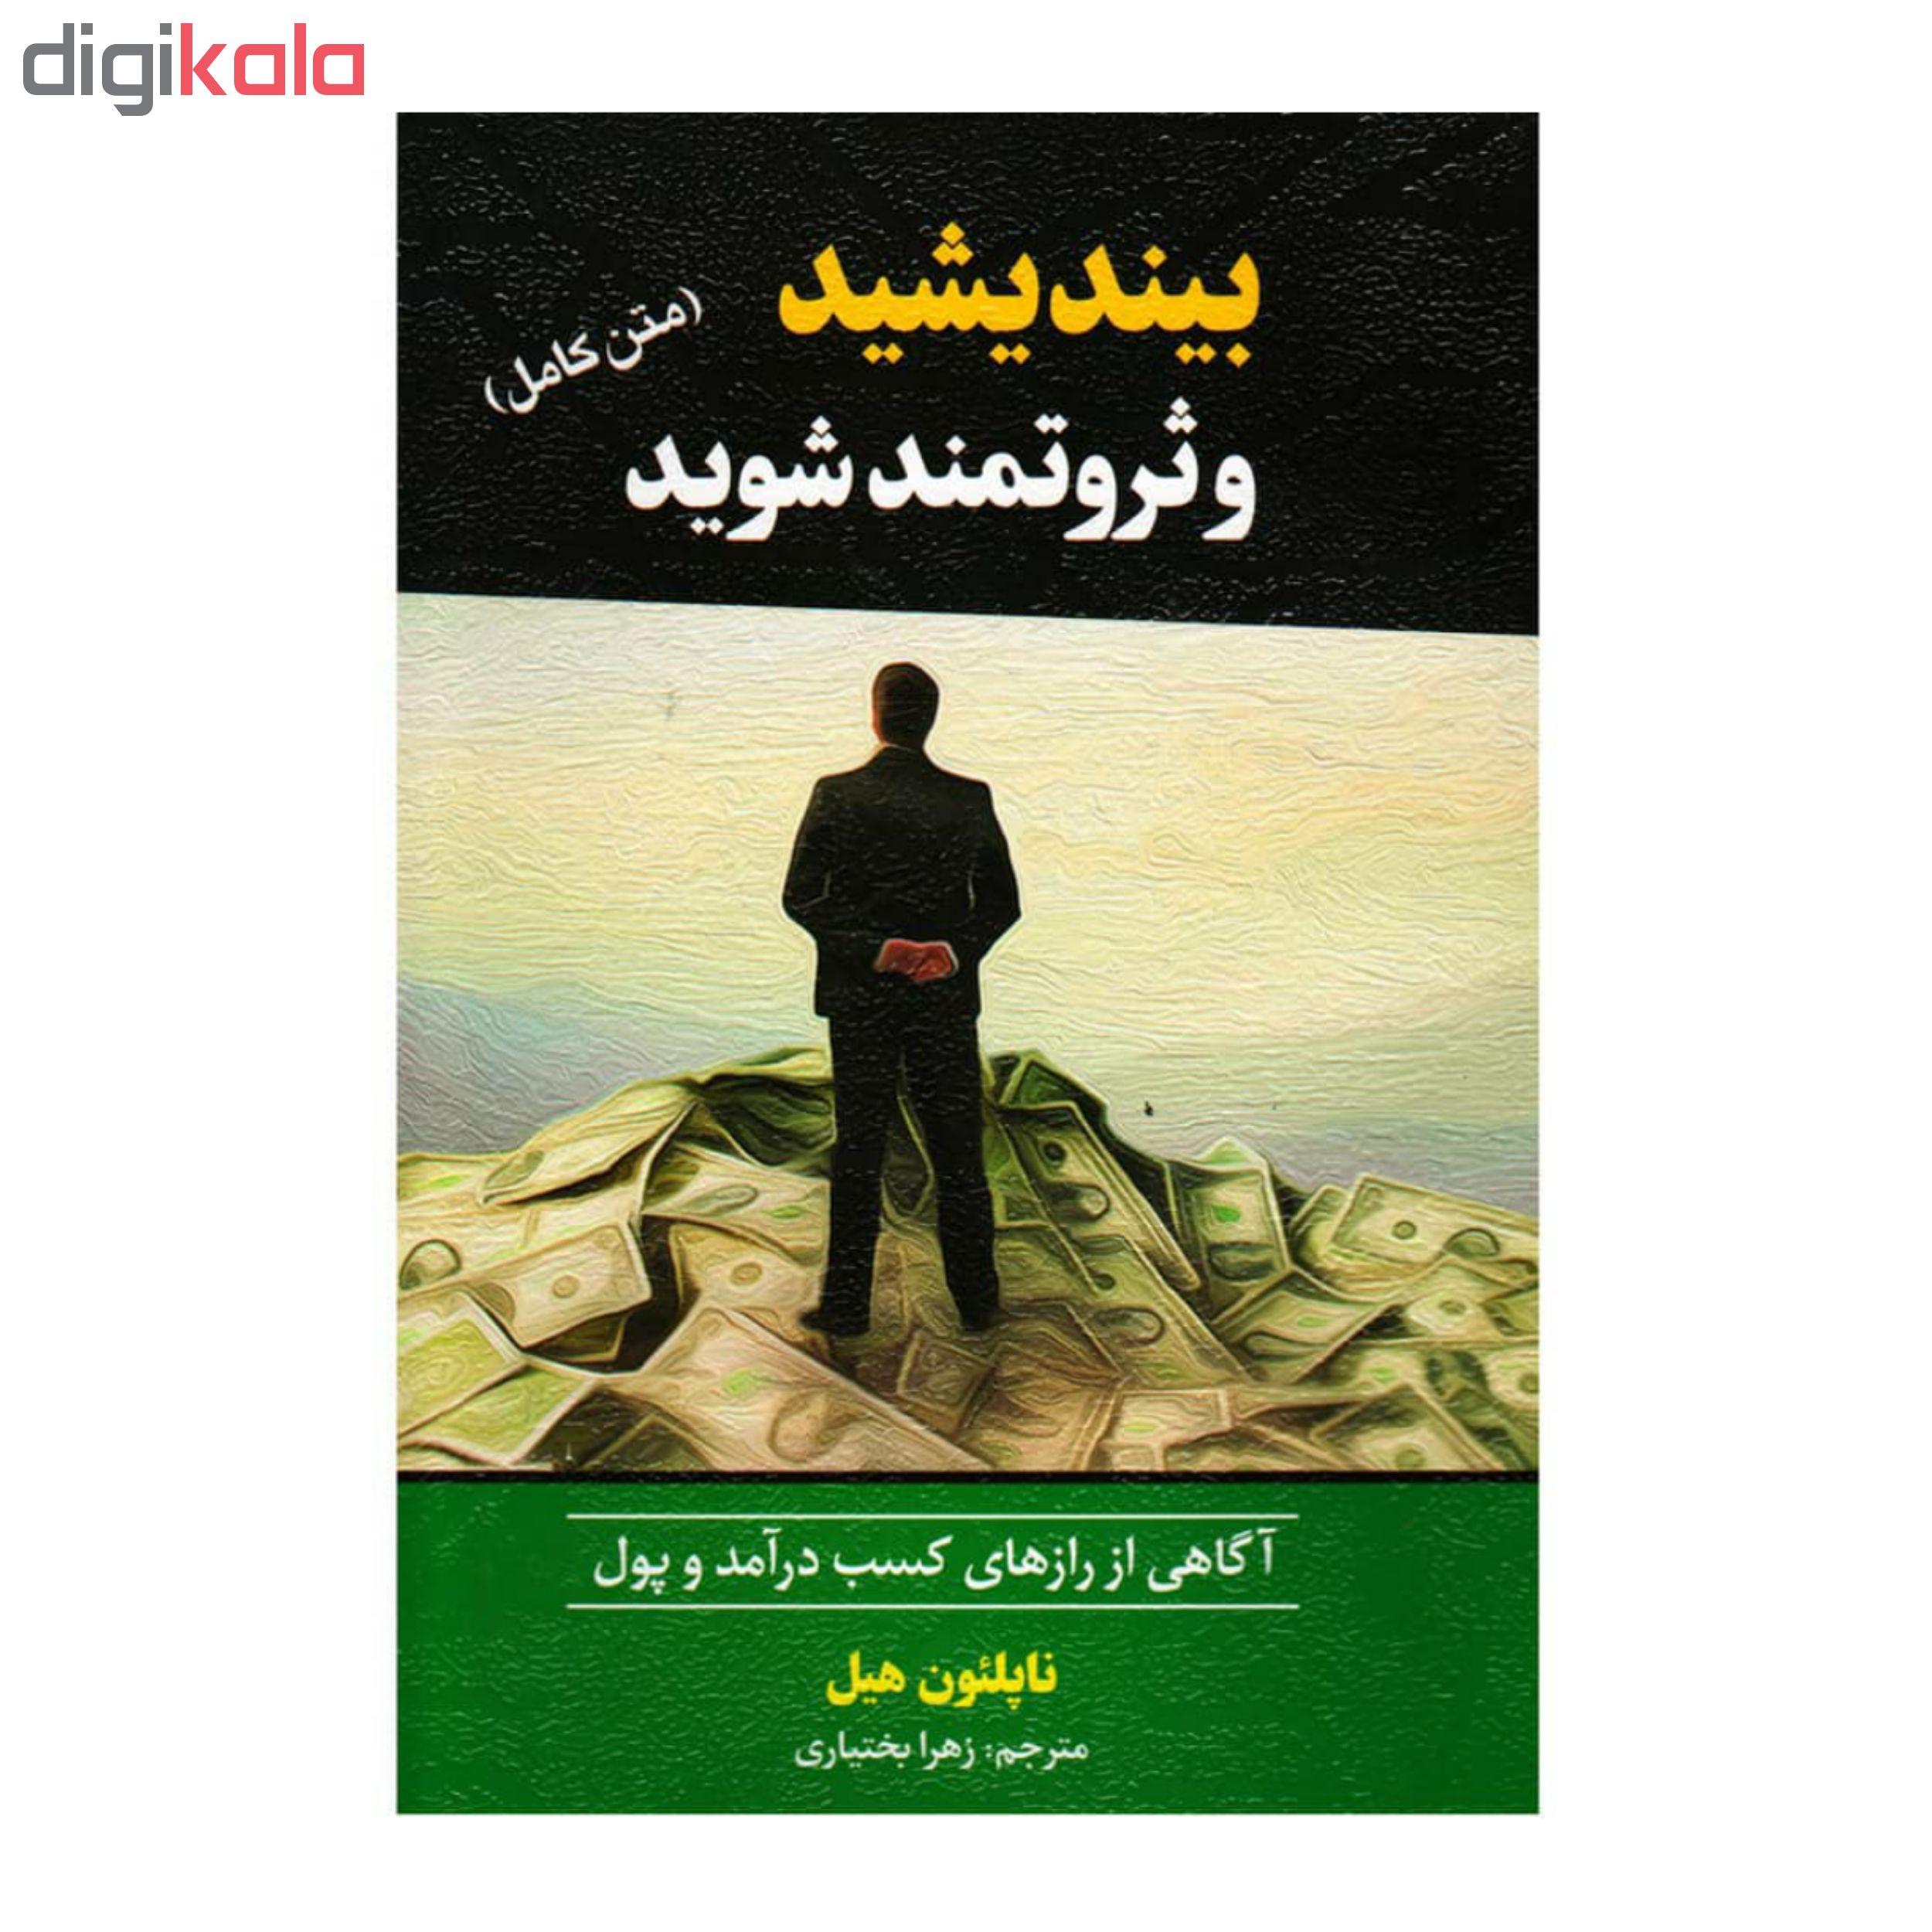 کتاب بیندیشید و ثروتمند شوید اثر ناپلئون هیل انتشارات آستان مهر main 1 1